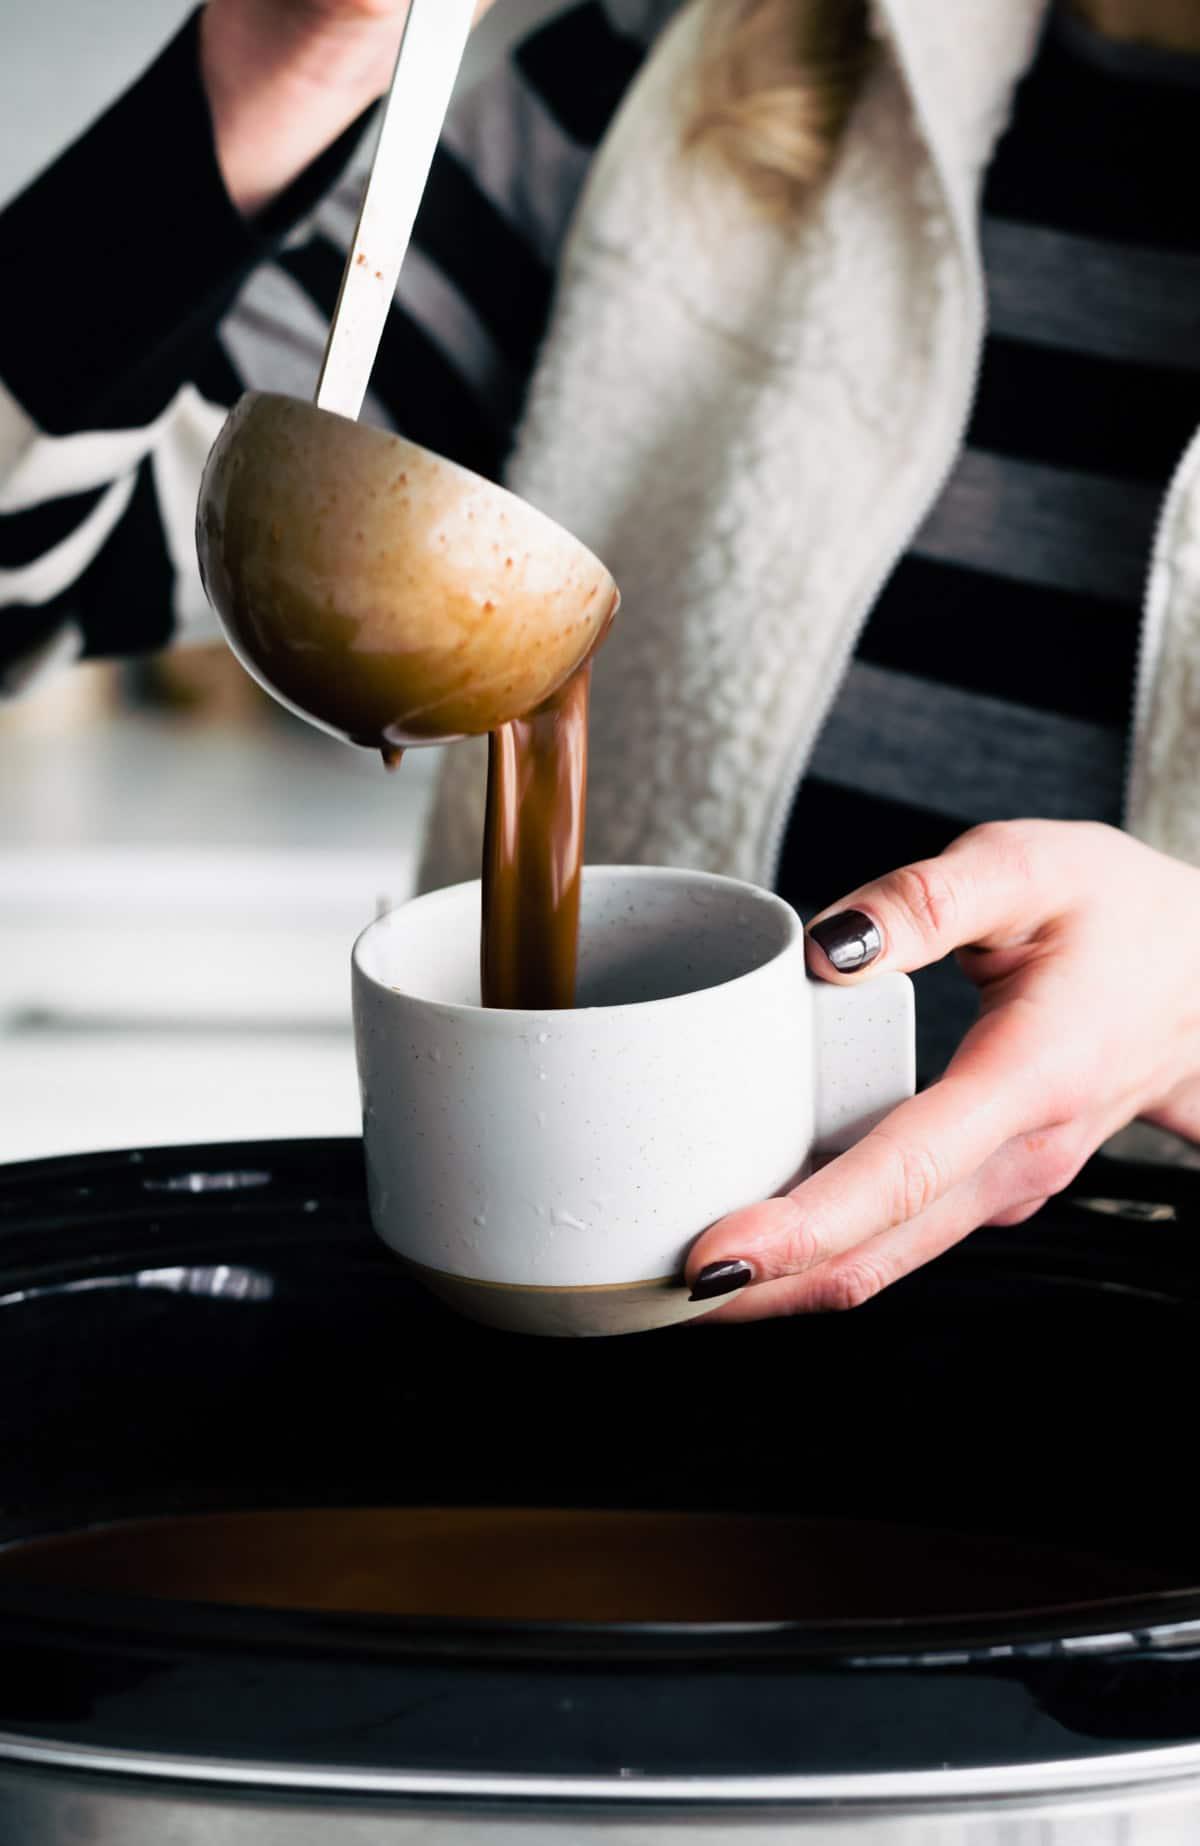 ladling hot chocolate from crockpot into a mug